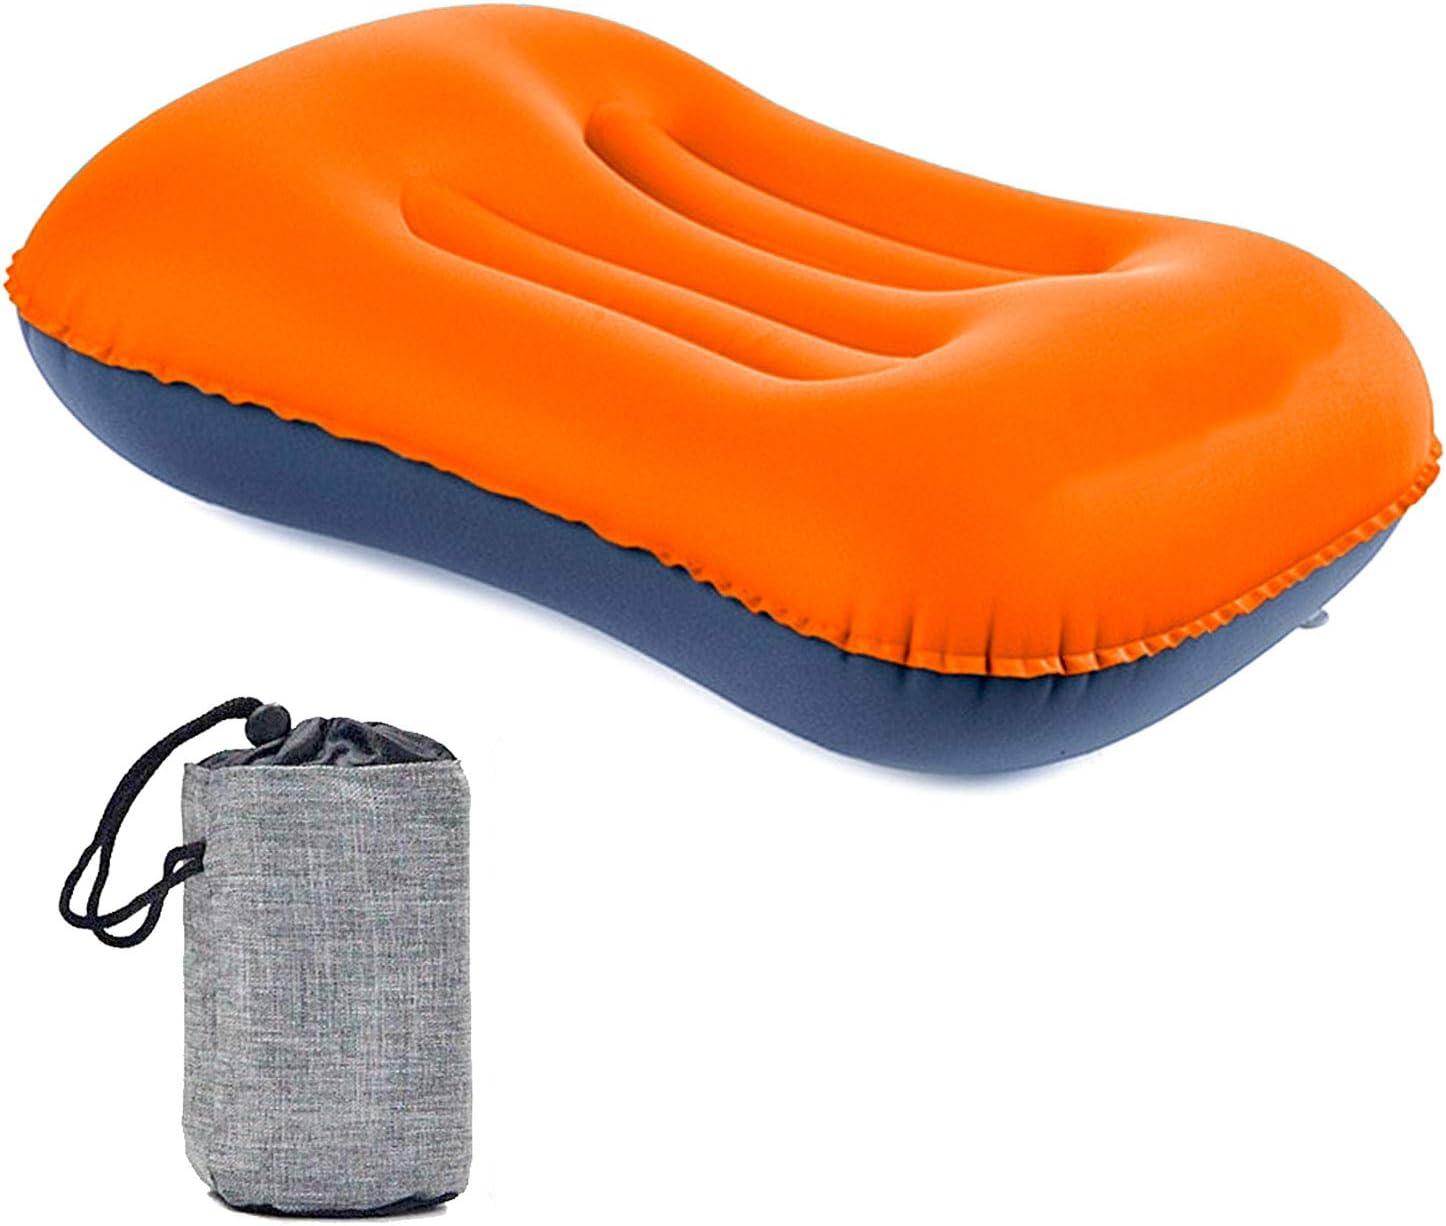 Almohada de viaje Lingye Coj/ín de camping Almohada de playa Almohada Coj/ín inflable Tambi/én inflable para acampar Avi/ón al aire libre o bolsa de regalo de viaje naranja